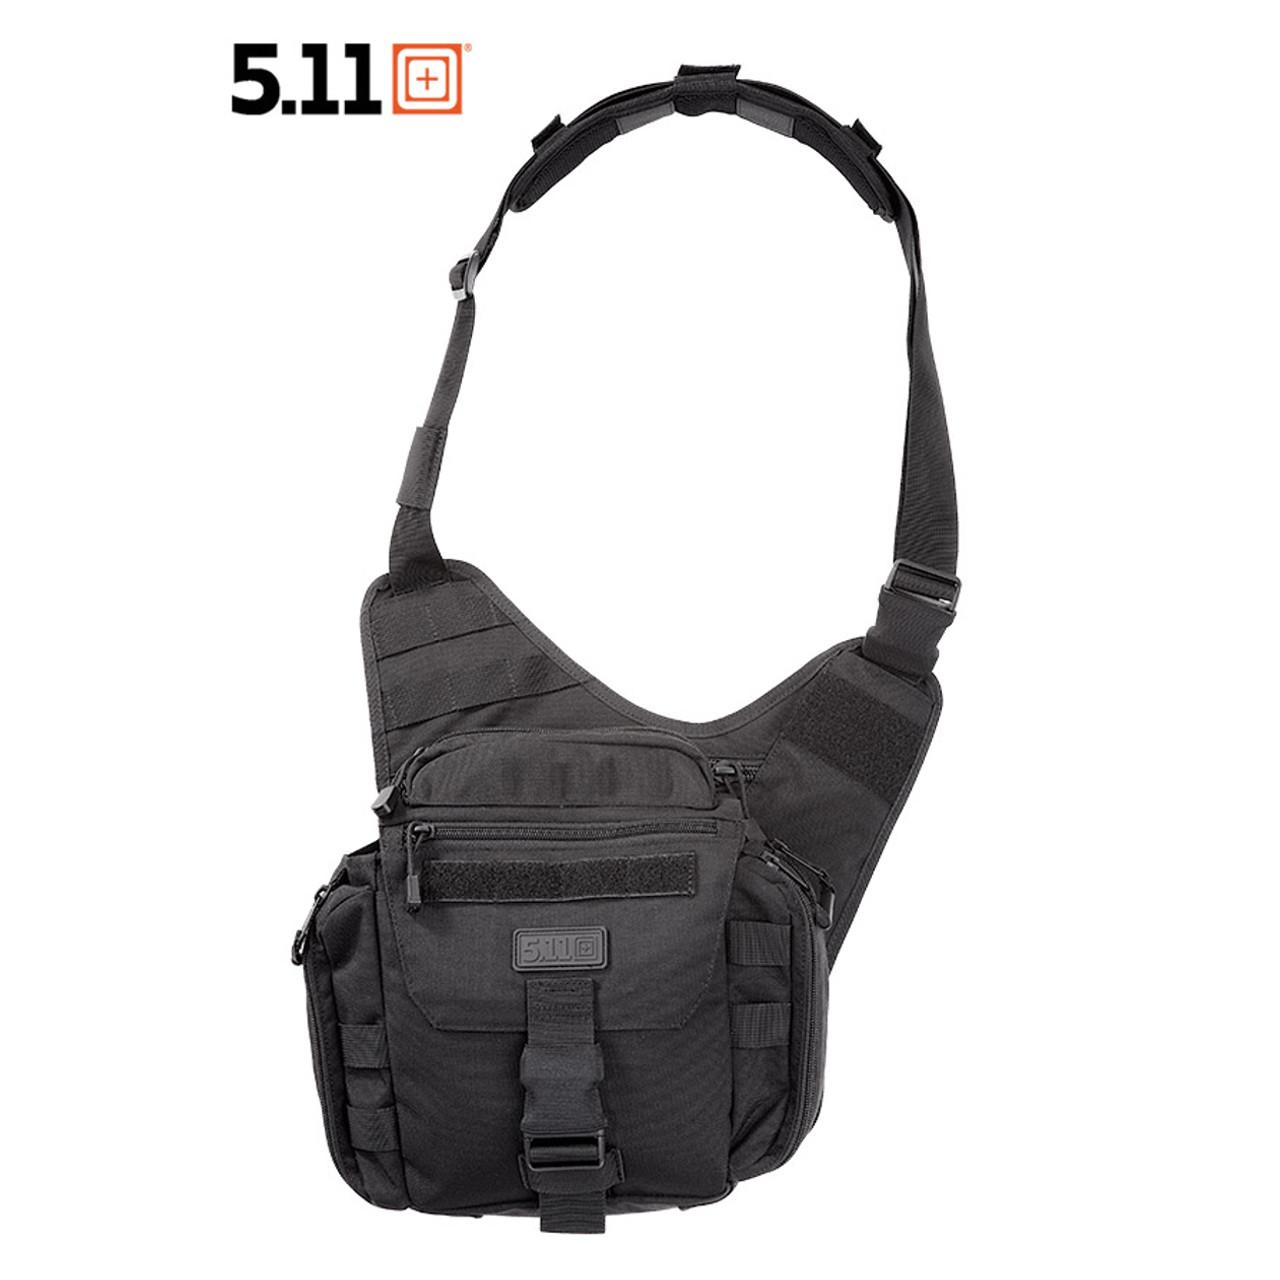 5.11 PUSH BAG in schwarz